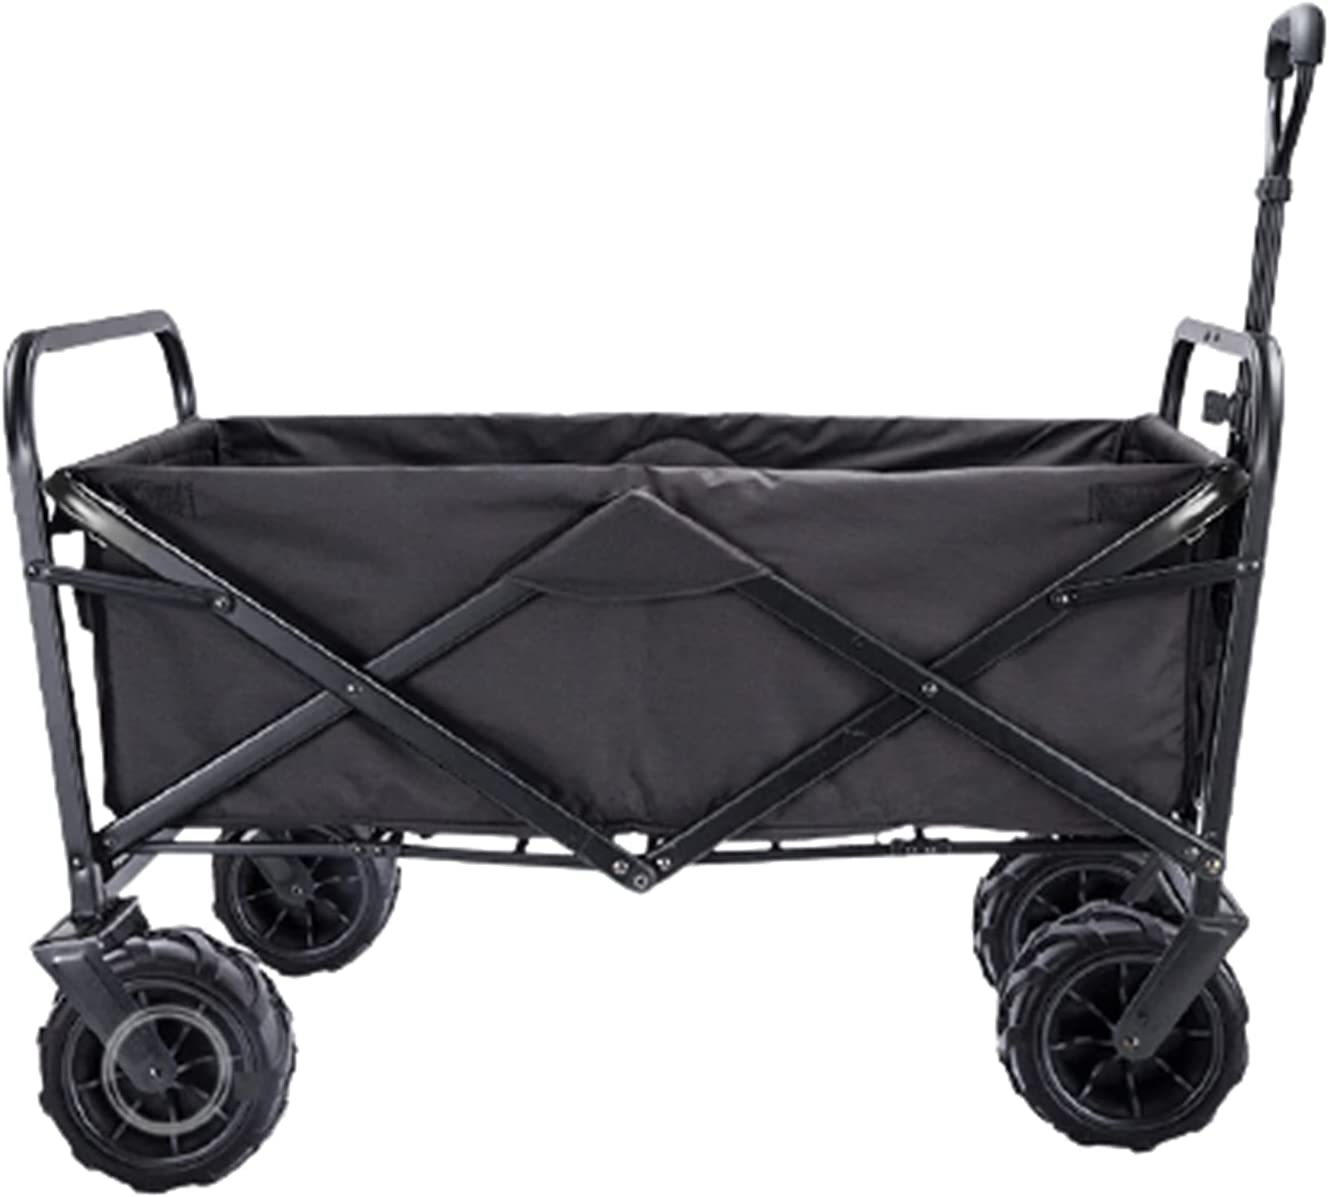 Garden Carts Folding Shopping Trolley Portable Four-Wheeled Trolley Camping Trolley,Black